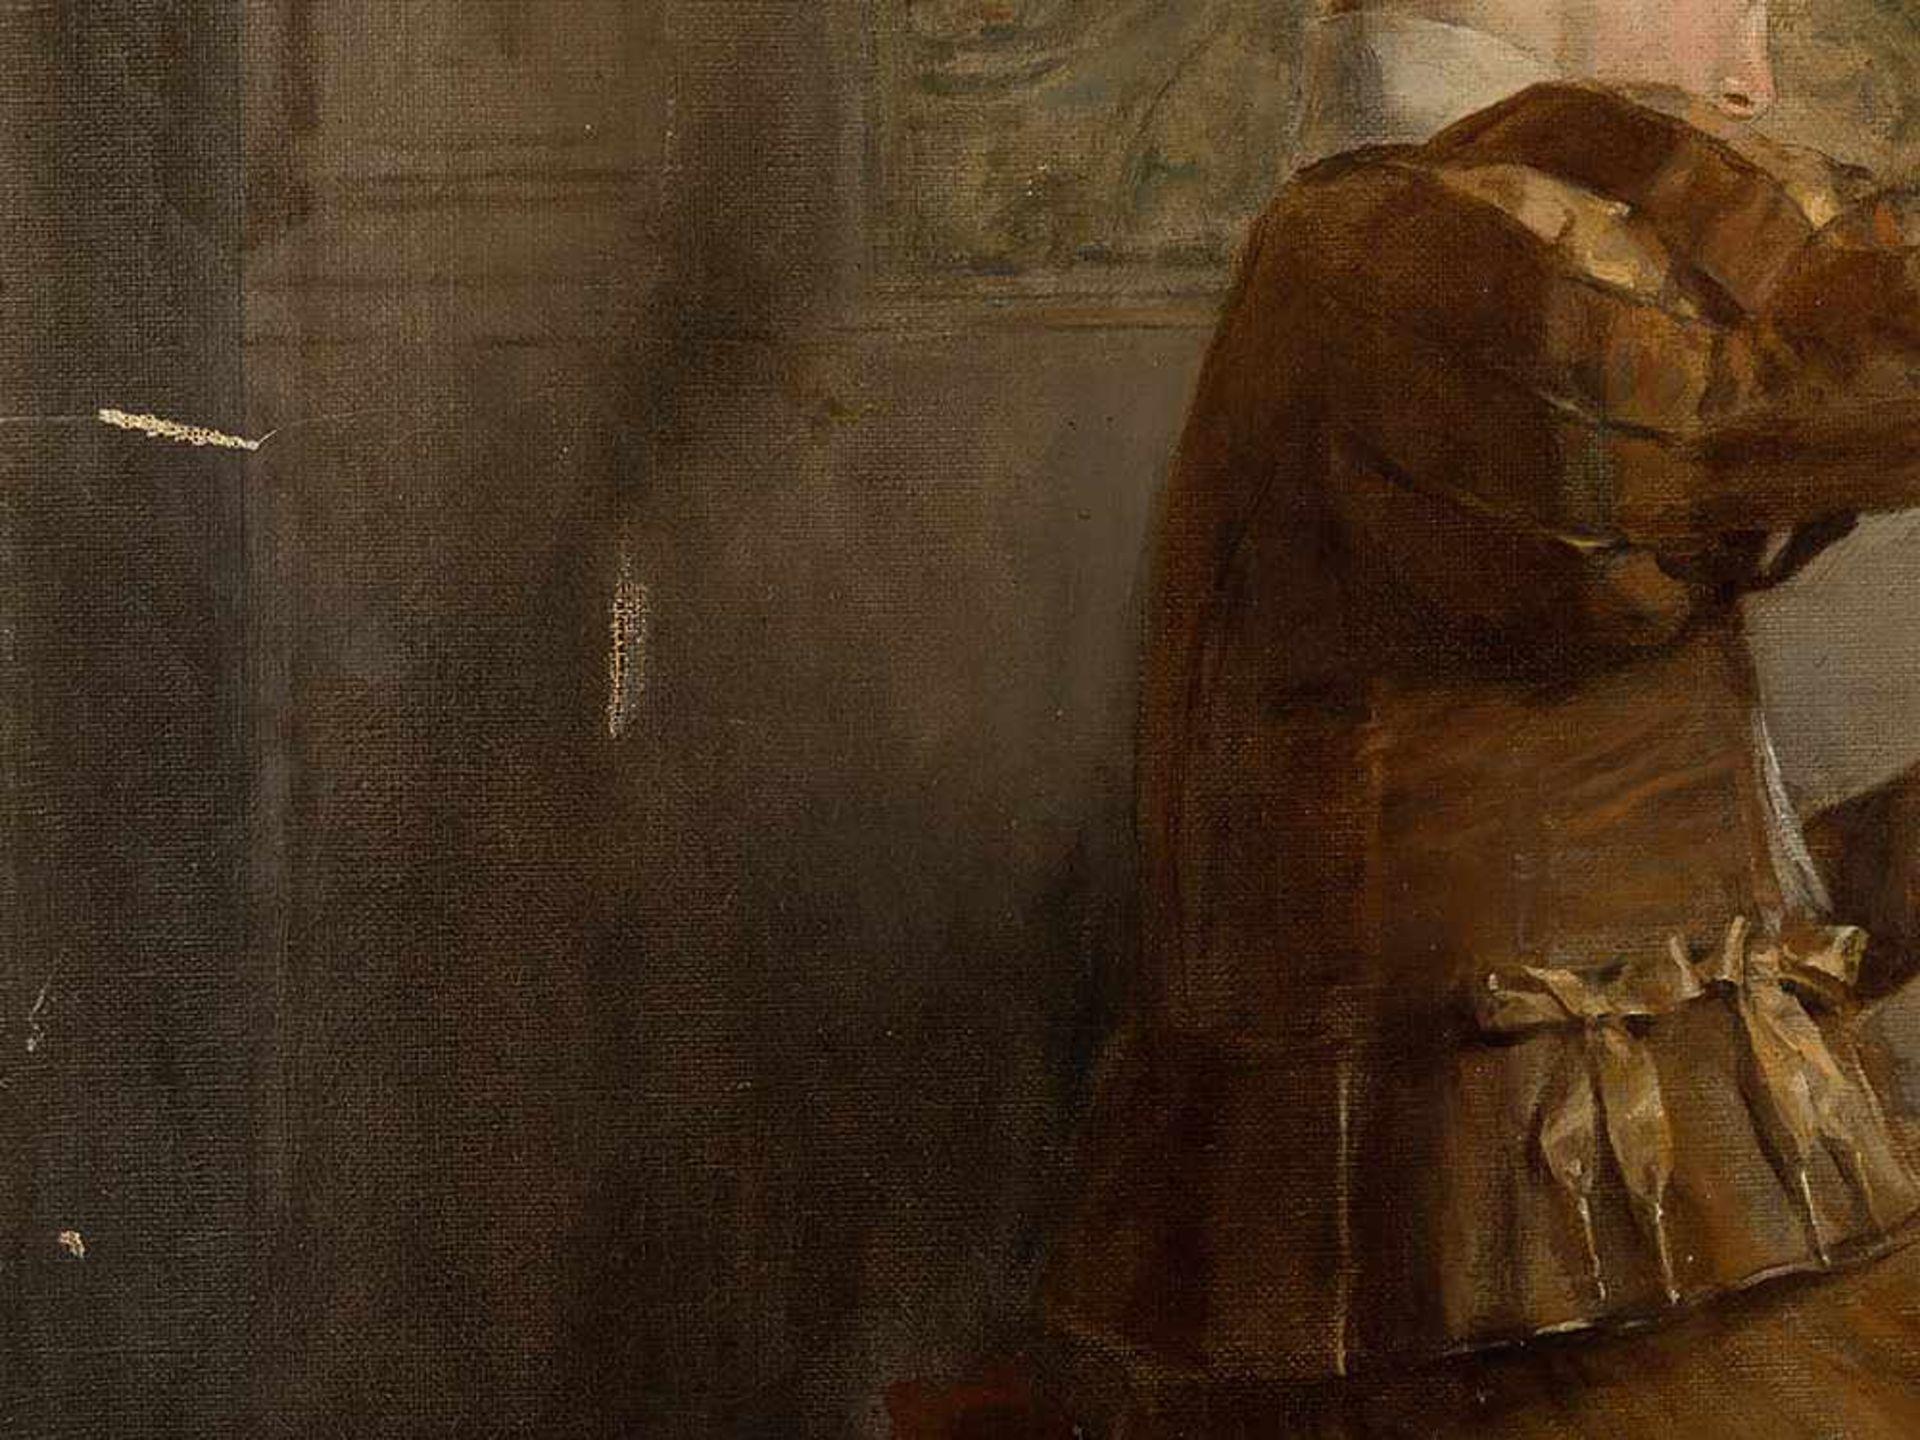 Los 69 - Roman Ribera Cirera (1849-1935), Kartenspieler, Öl, um 1890 Öl auf Leinwand. Spanien, um 1890.